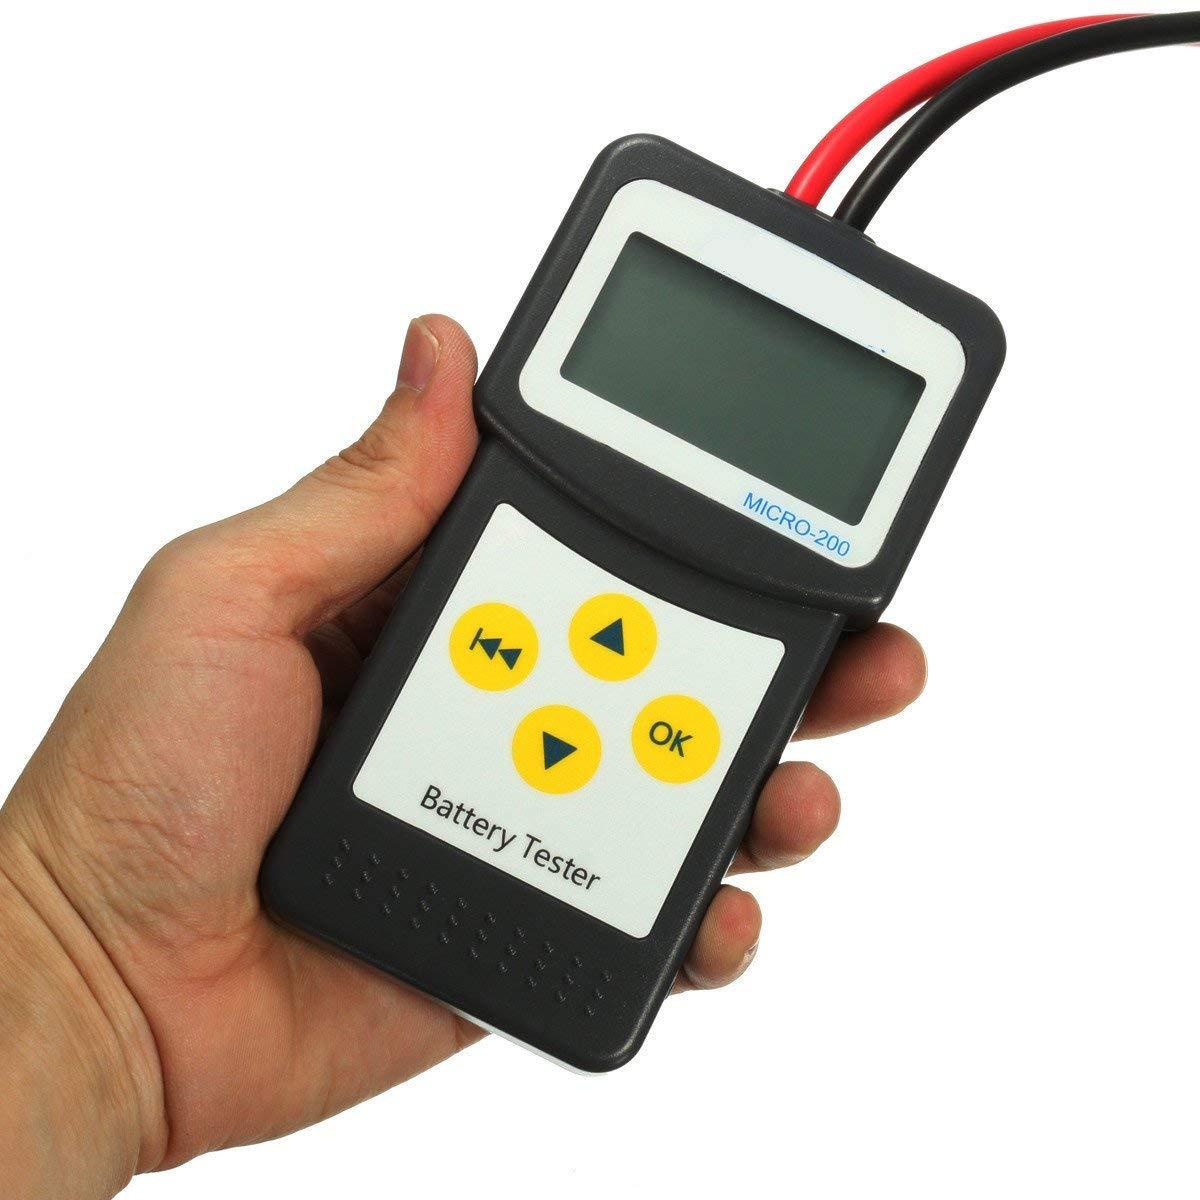 CoCocina 12V Car Battery Tester Automotive Vehicle Battery Analyzer AGM GEL MICRO-200